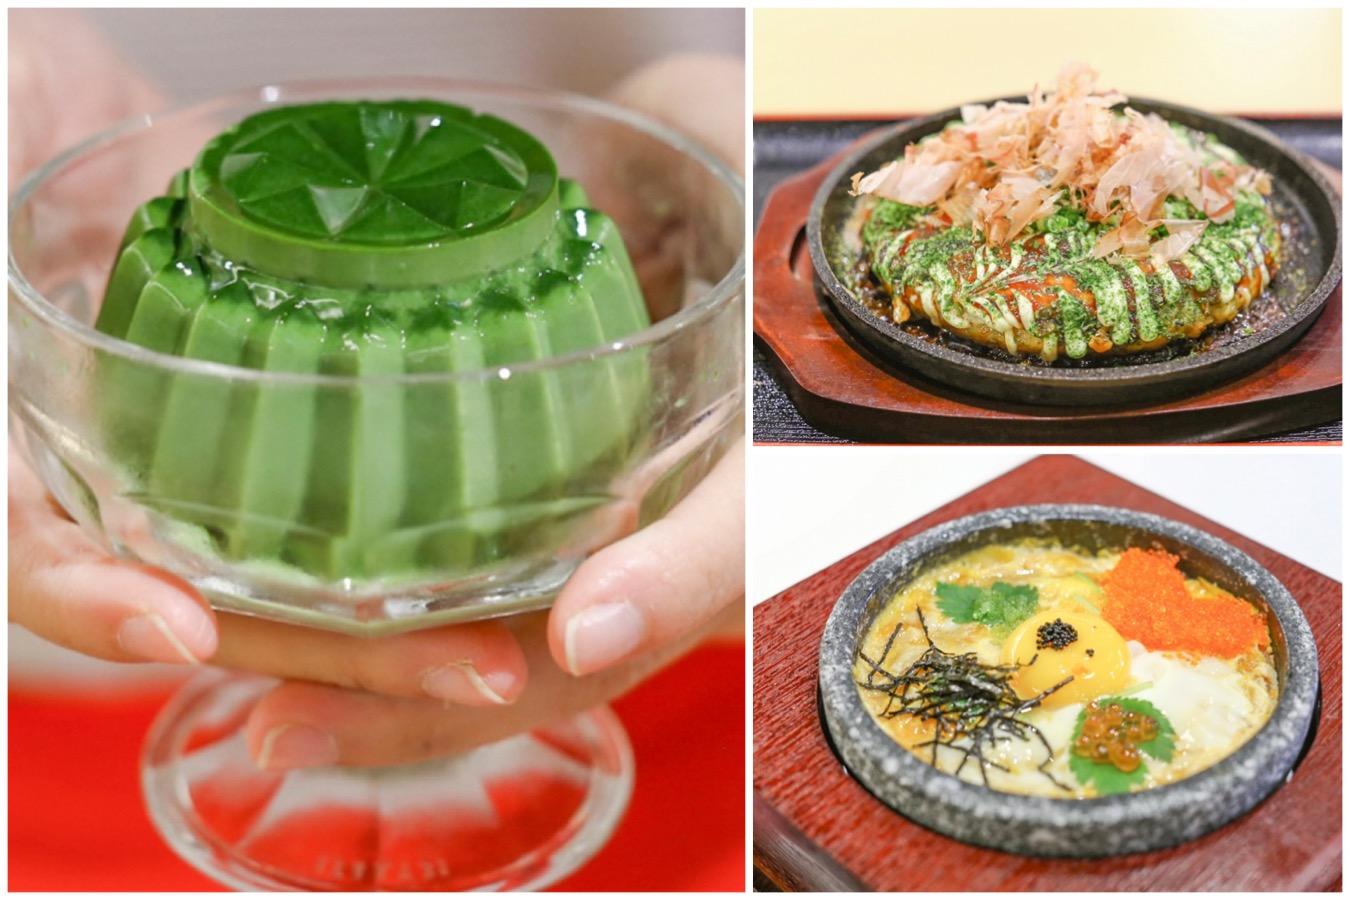 Misato - Impossibly Wobbly Matcha Pudding, Worthy Cha Soba And Okonomiyaki At The Centrepoint